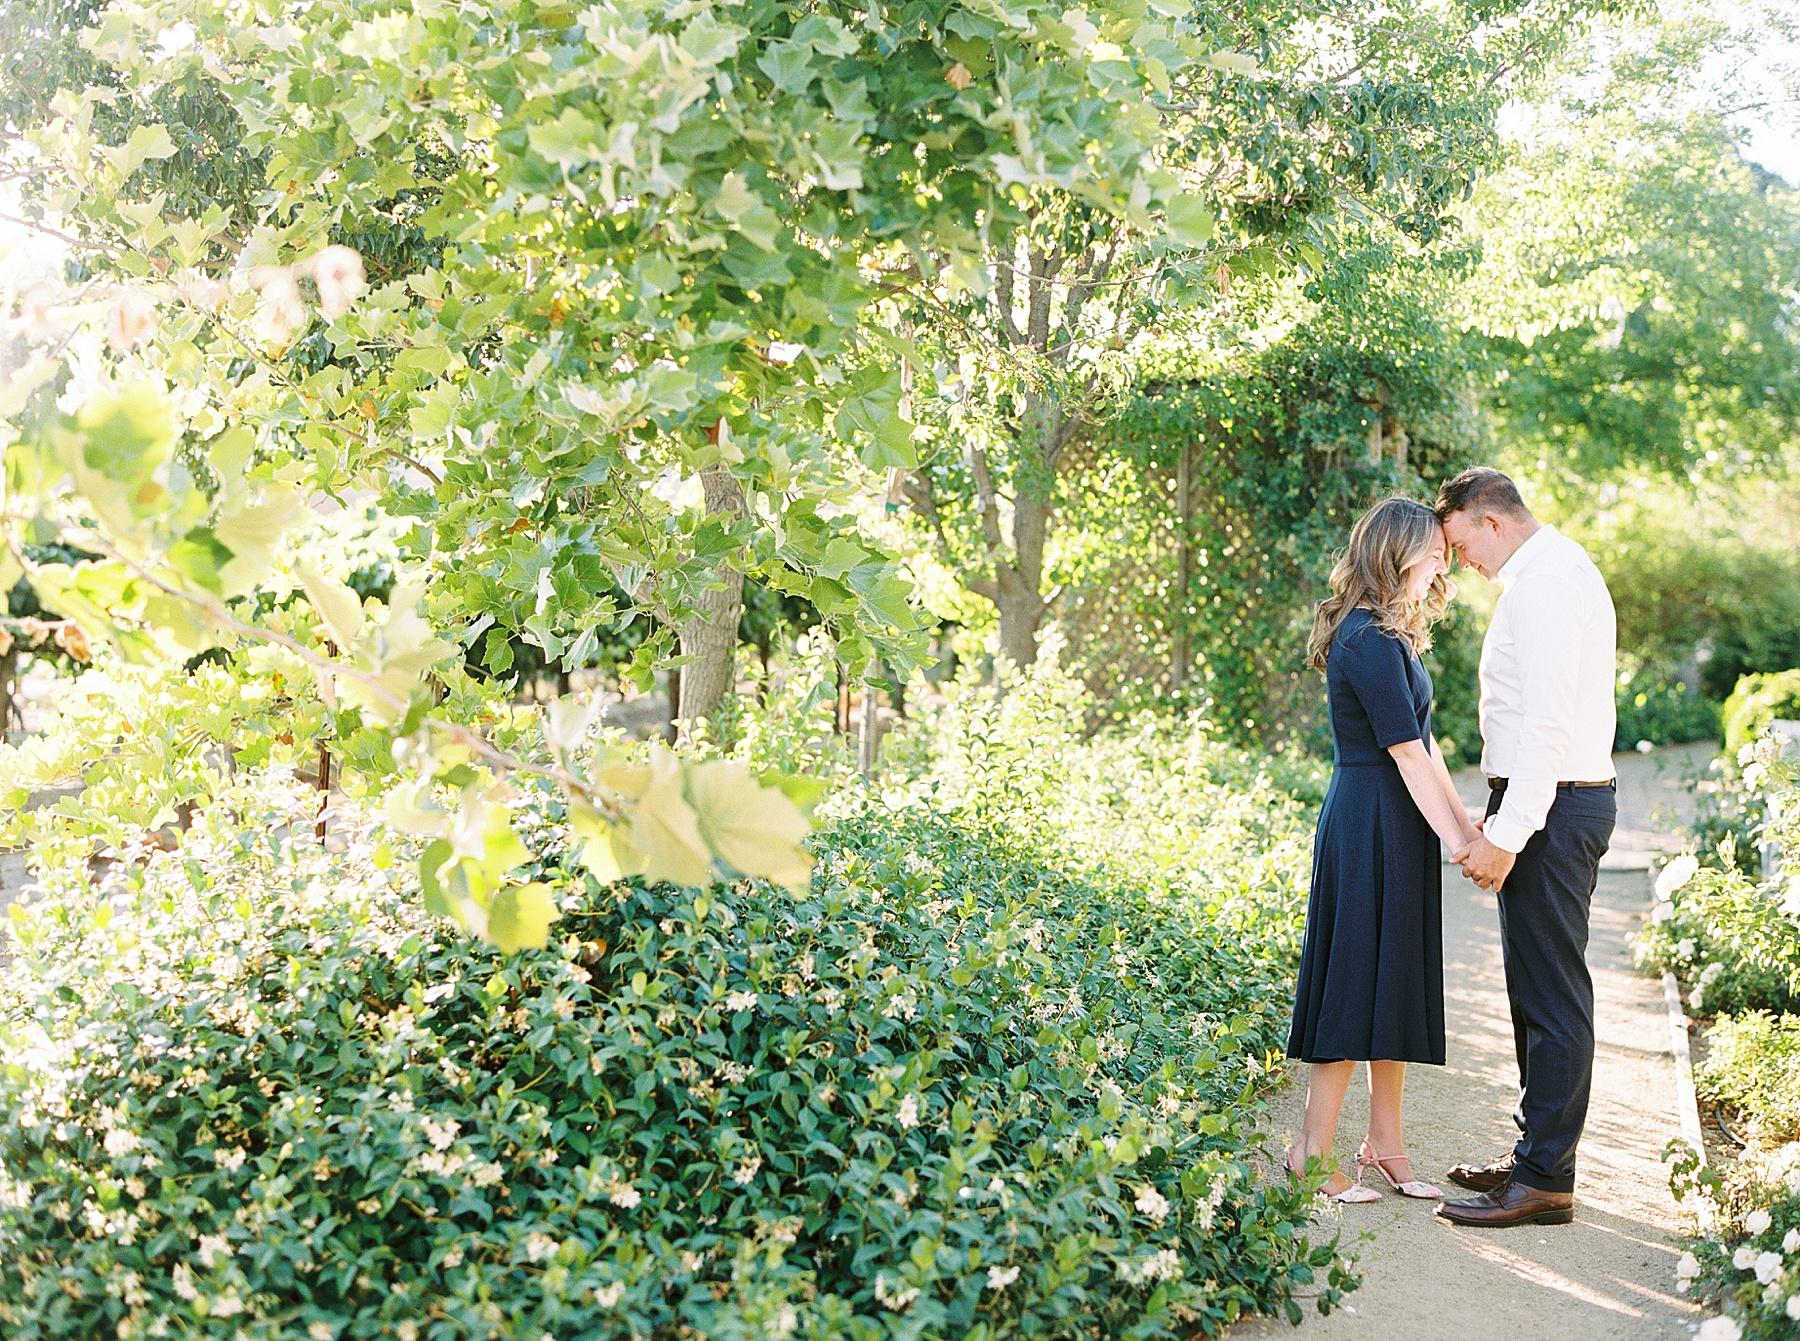 Scribner Bend Winery Engagement Session - Courtney and Steven - Ashley Baumgartner - Sribner Bend Wedding Photographer - Sacramento Wedding Photographer_0005.jpg